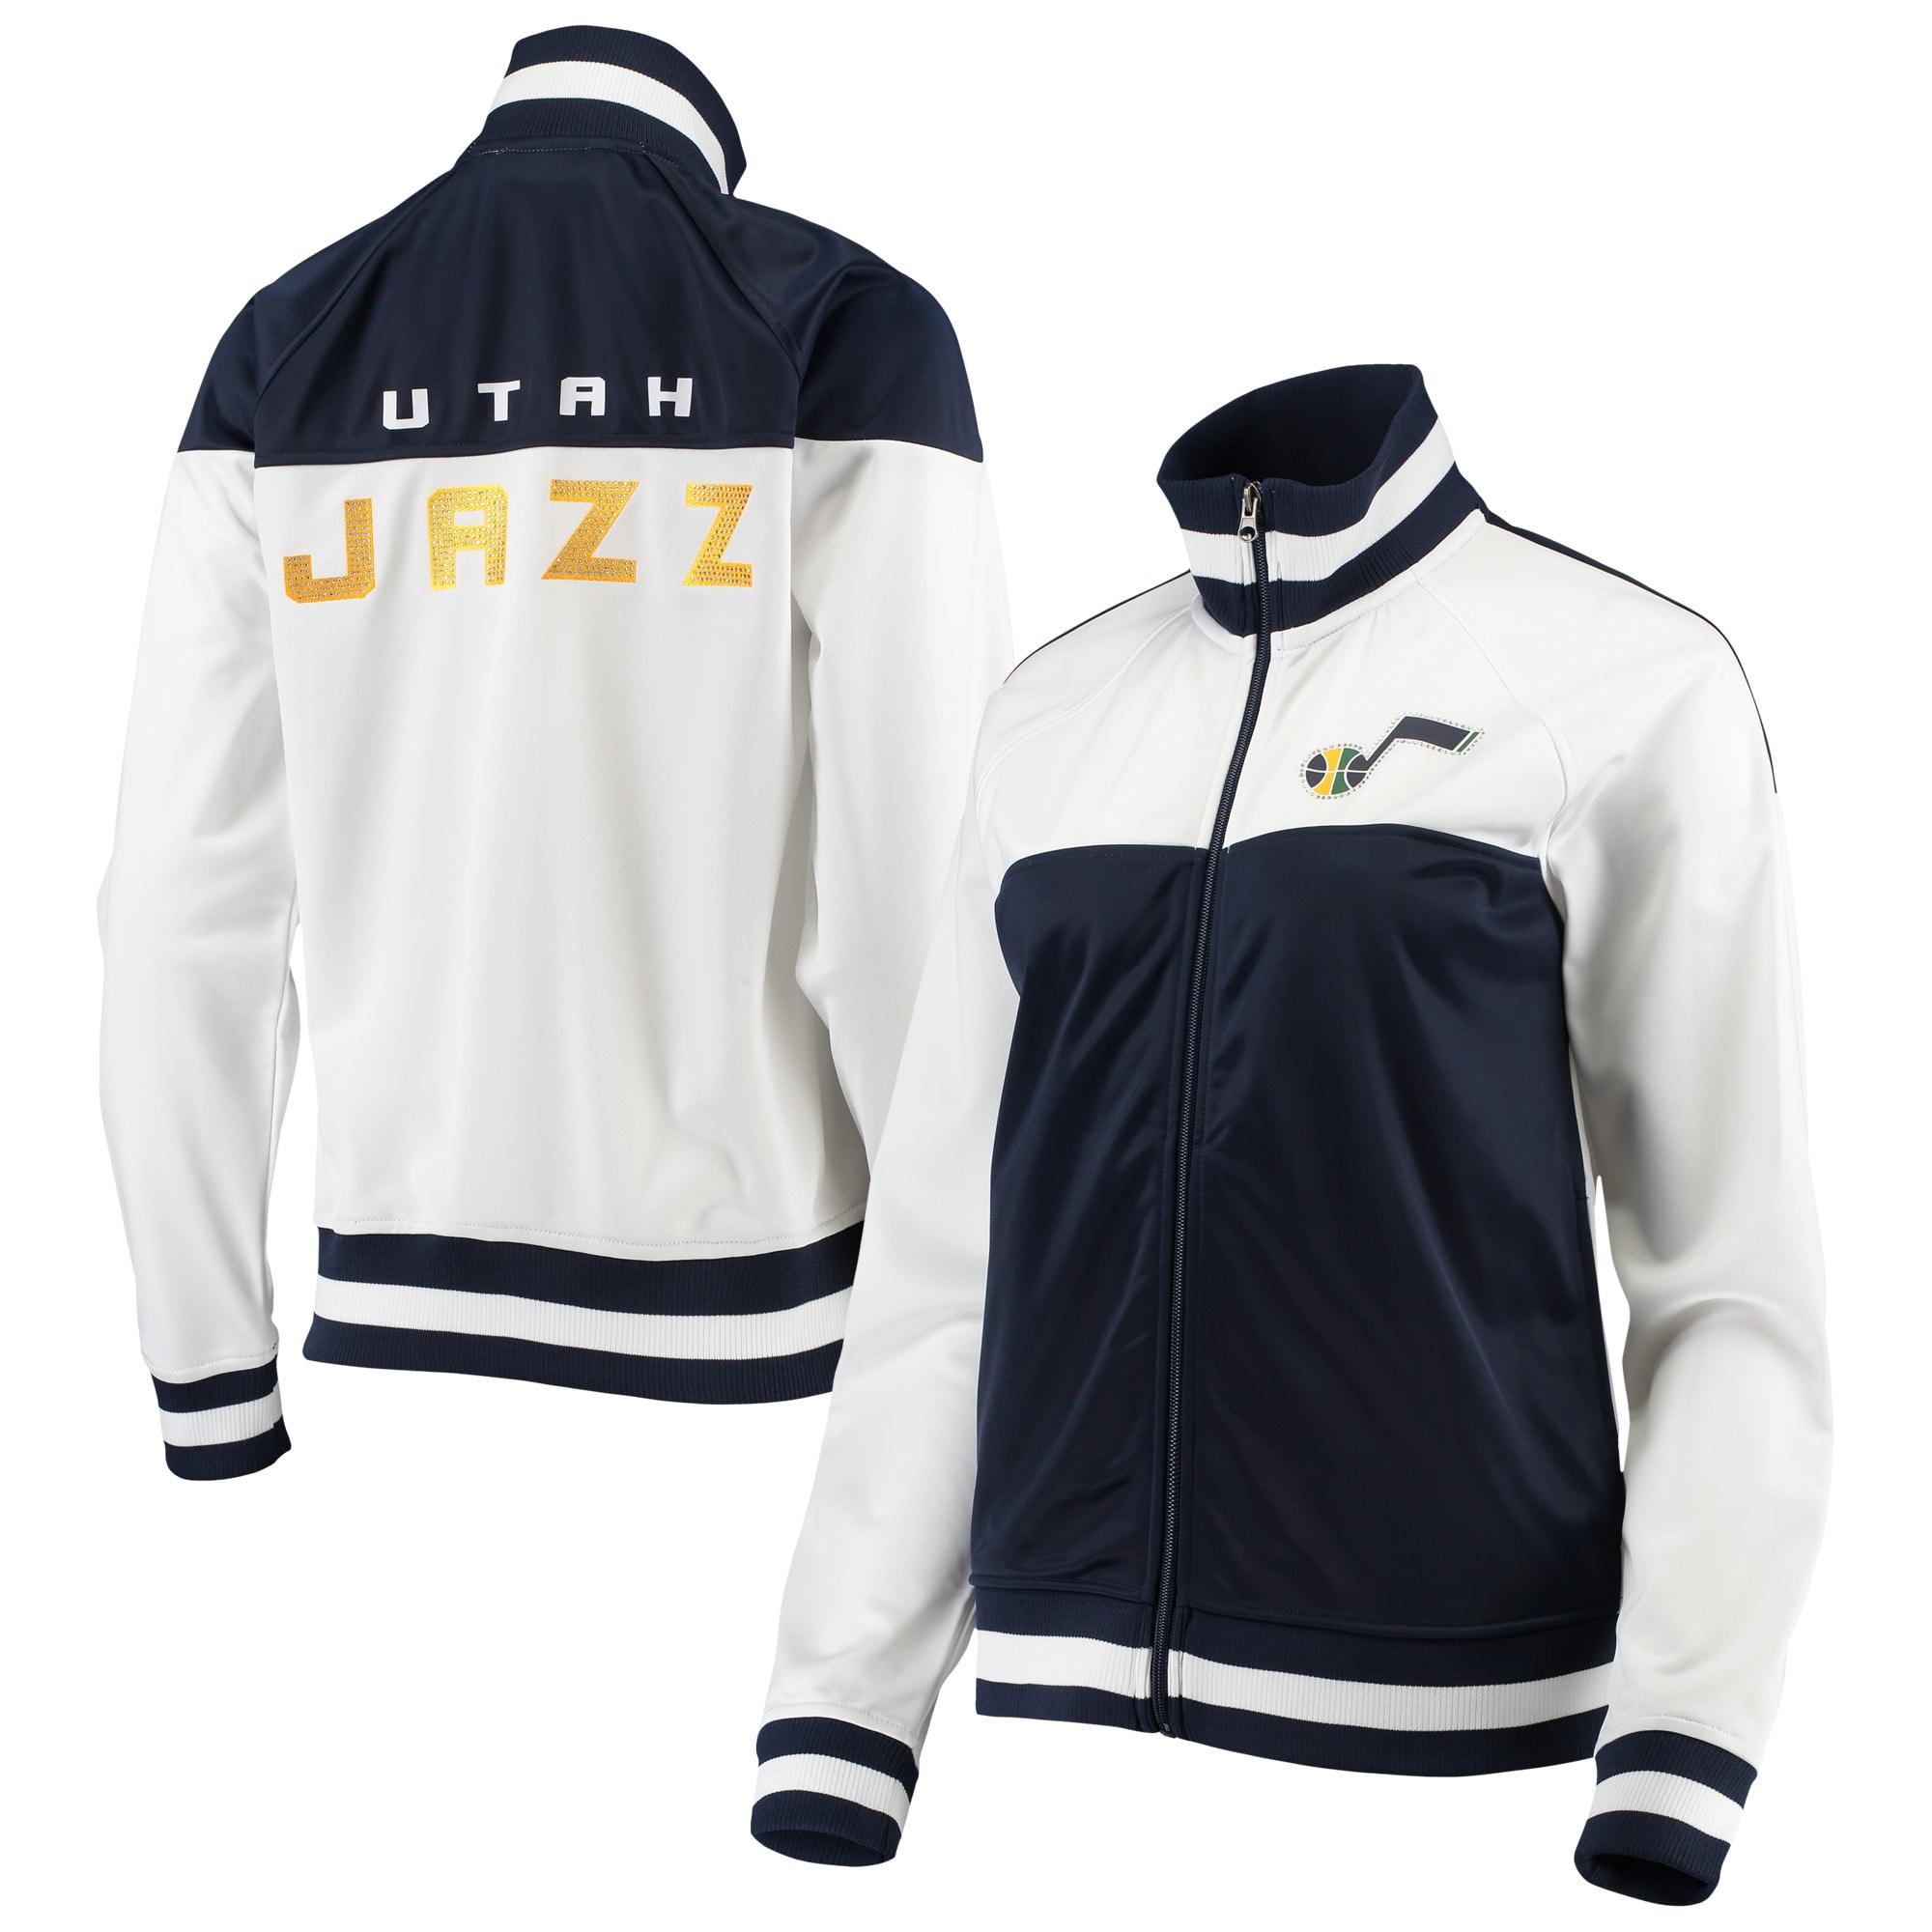 Utah Jazz G-III 4Her by Carl Banks Women's Tip Off Rhinestone Tricot Full-Zip Track Jacket - White/Navy